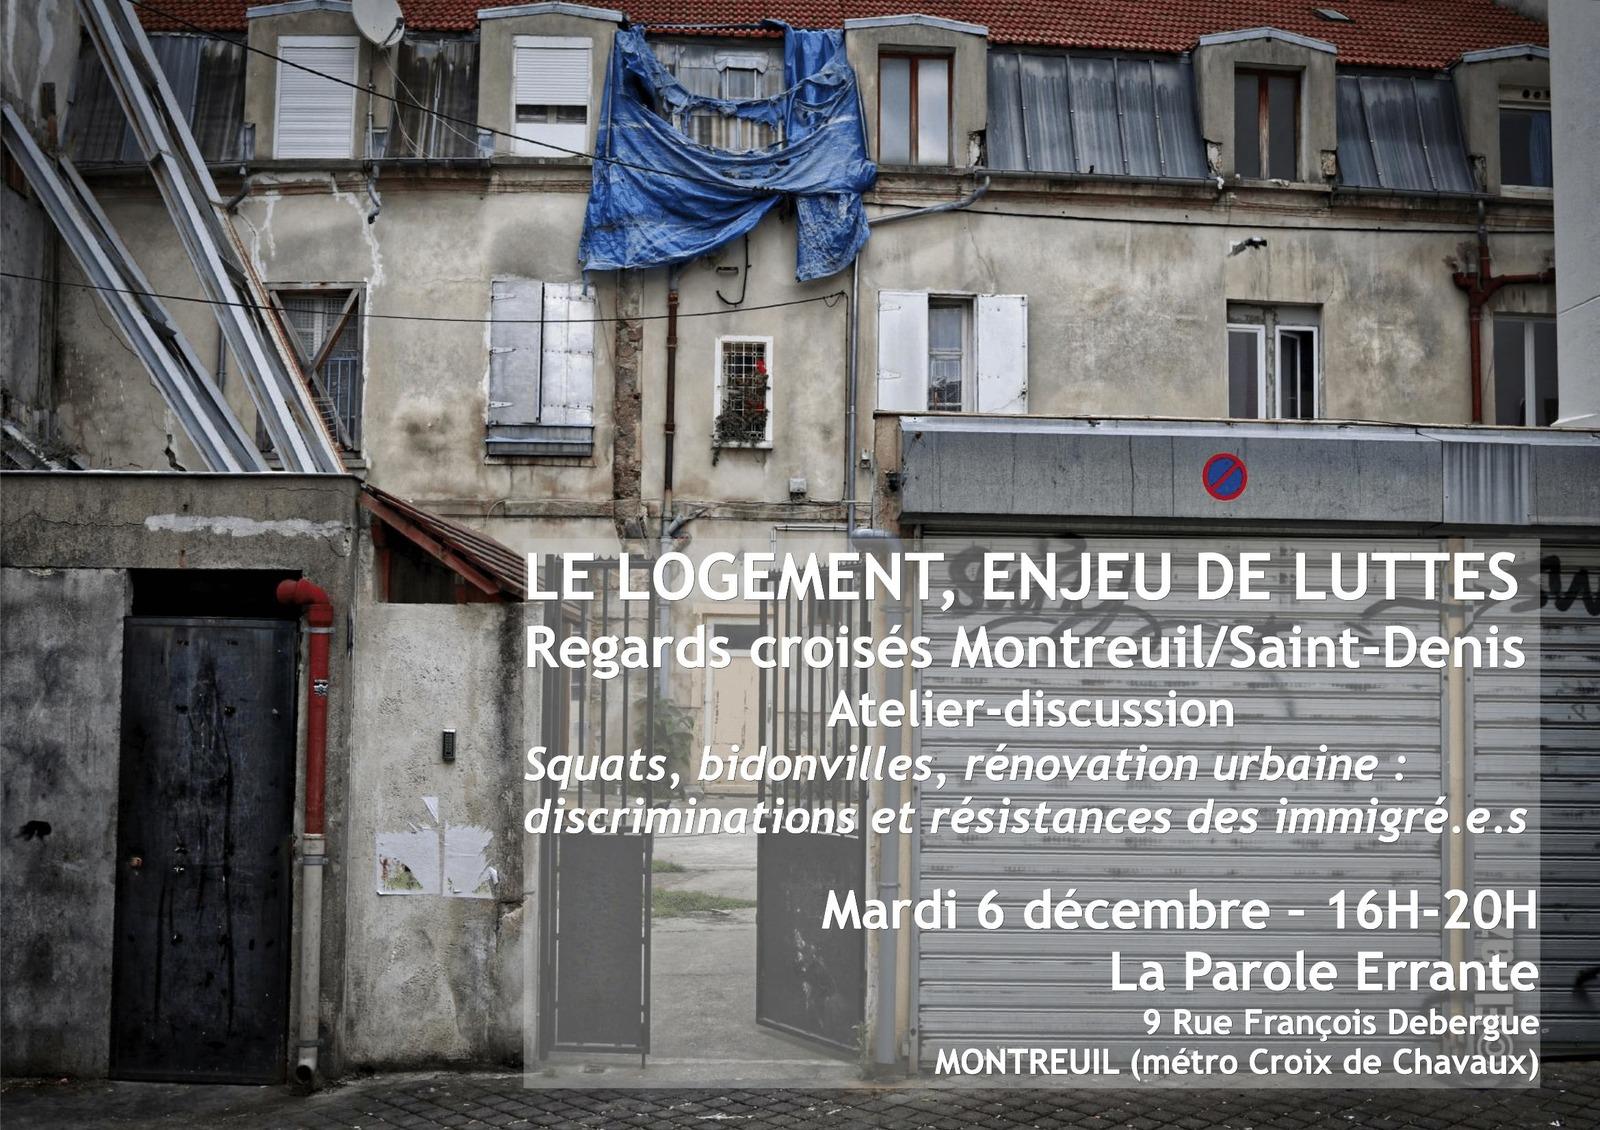 evfevent atelier-itinerant-lilar-luttes-de-l-immigration-luttes-antiracistes 430591.jpg a698a66f26ce